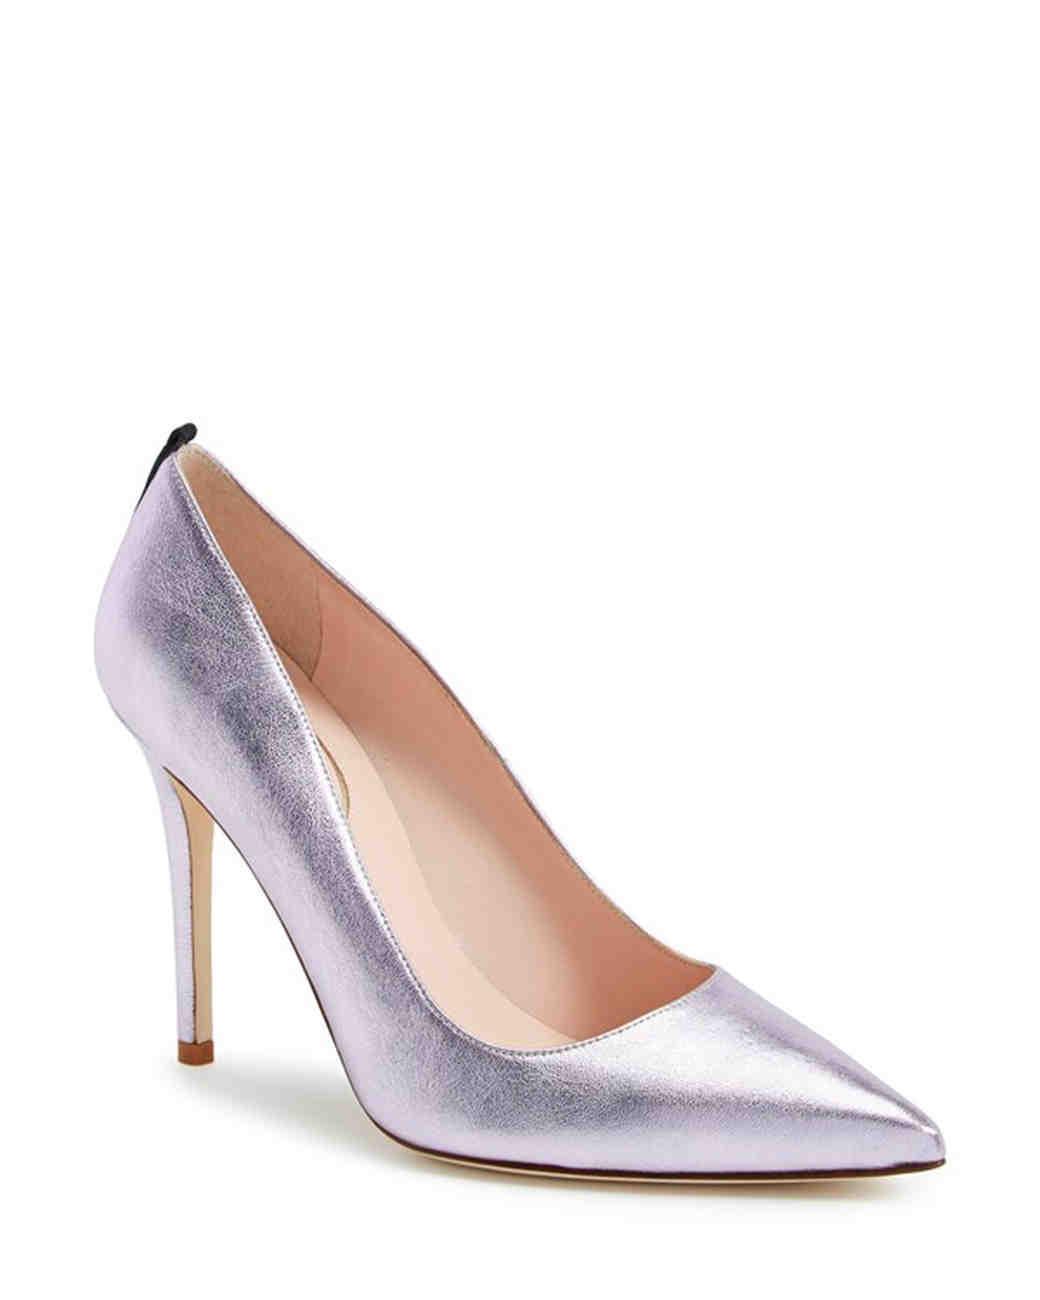 closed-toe-wedding-shoes-sjp-nordstrom-1215.jpg